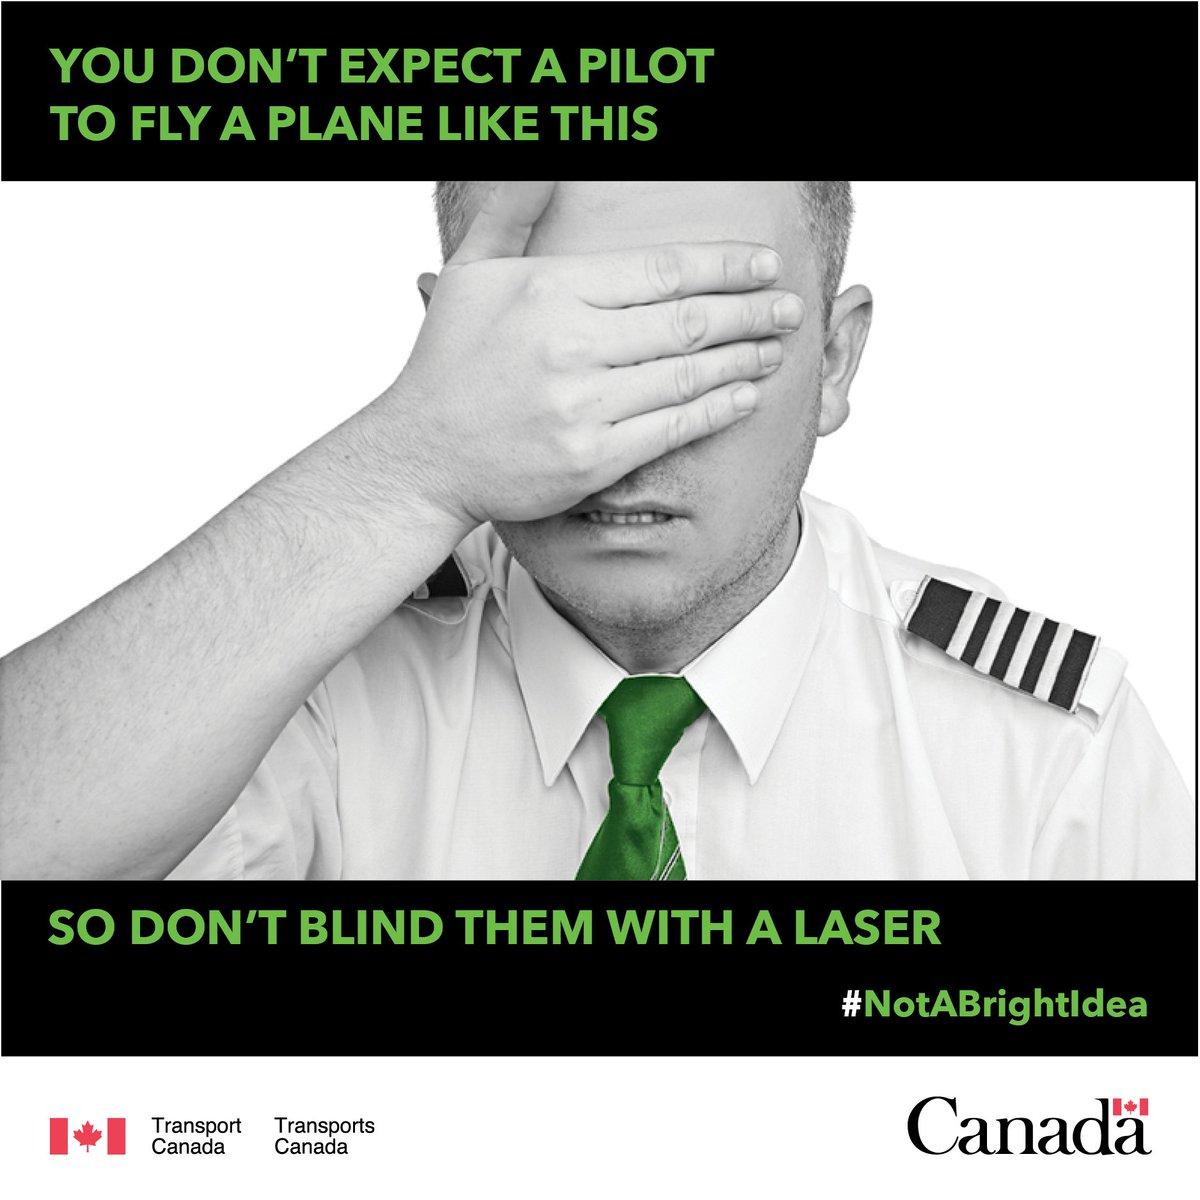 Laser strikes can leave pilots flying blind #NotABrightIdea https://t.co/ZbSPiC1kkz https://t.co/8I1JKGlvHb